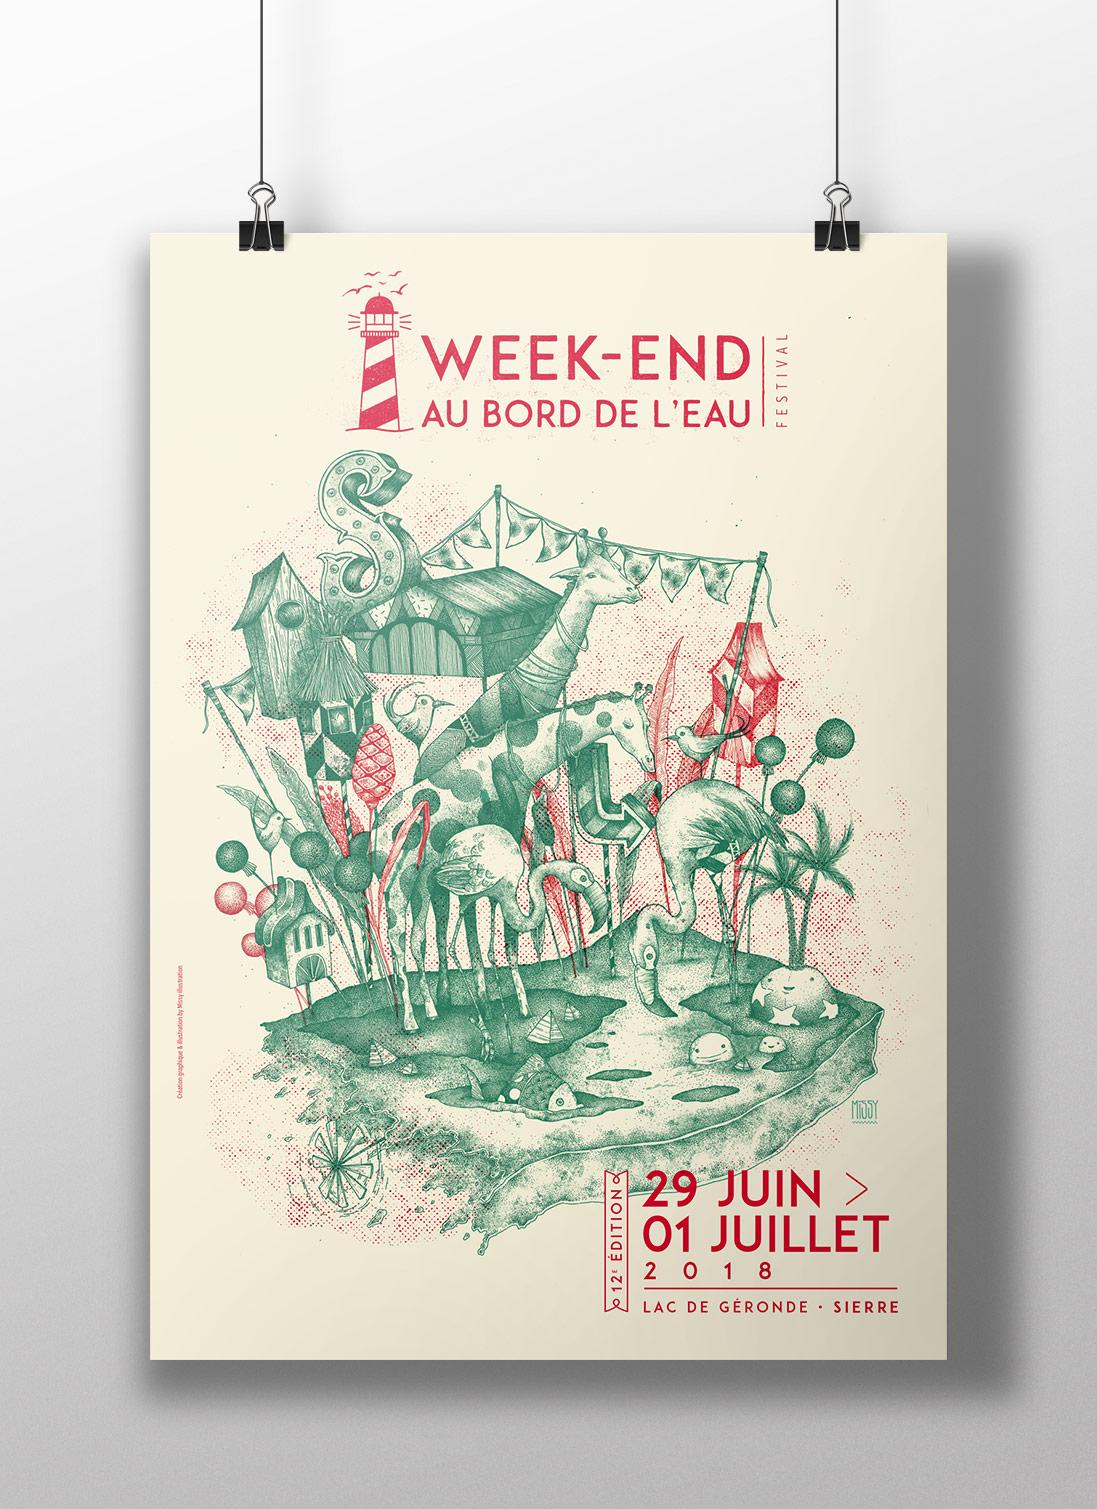 week-end-bord-eau-2018